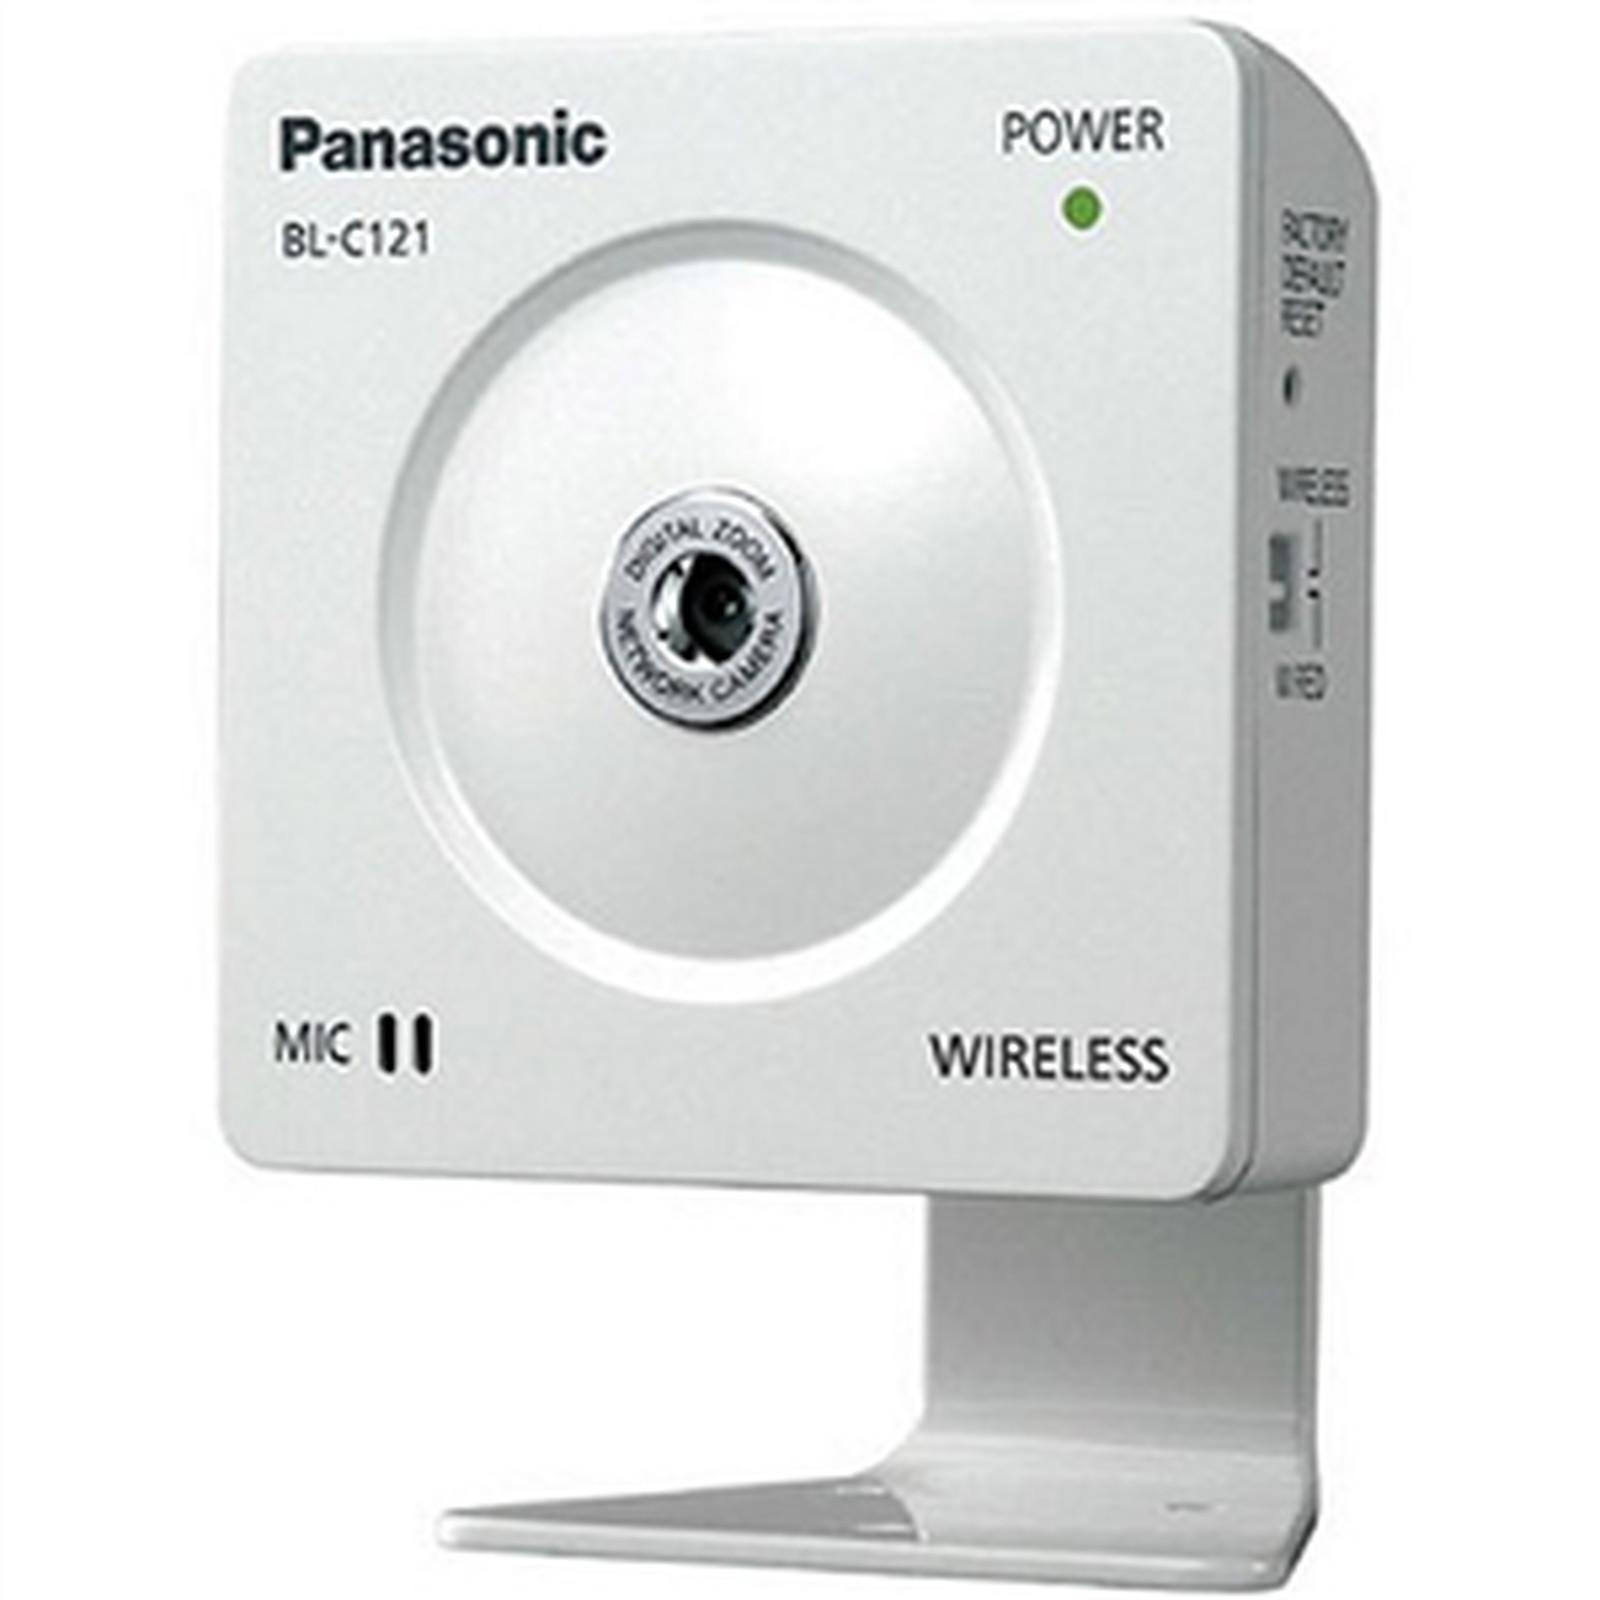 My Fox Panasonic BL-C121